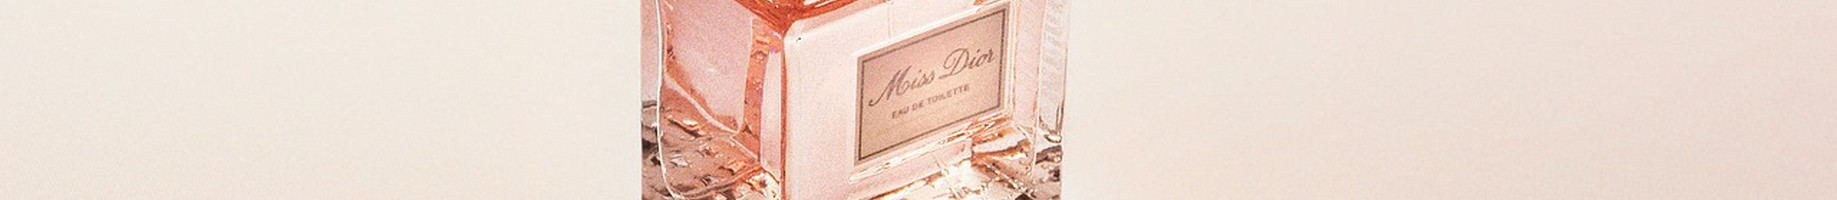 perfume-2574073_1280